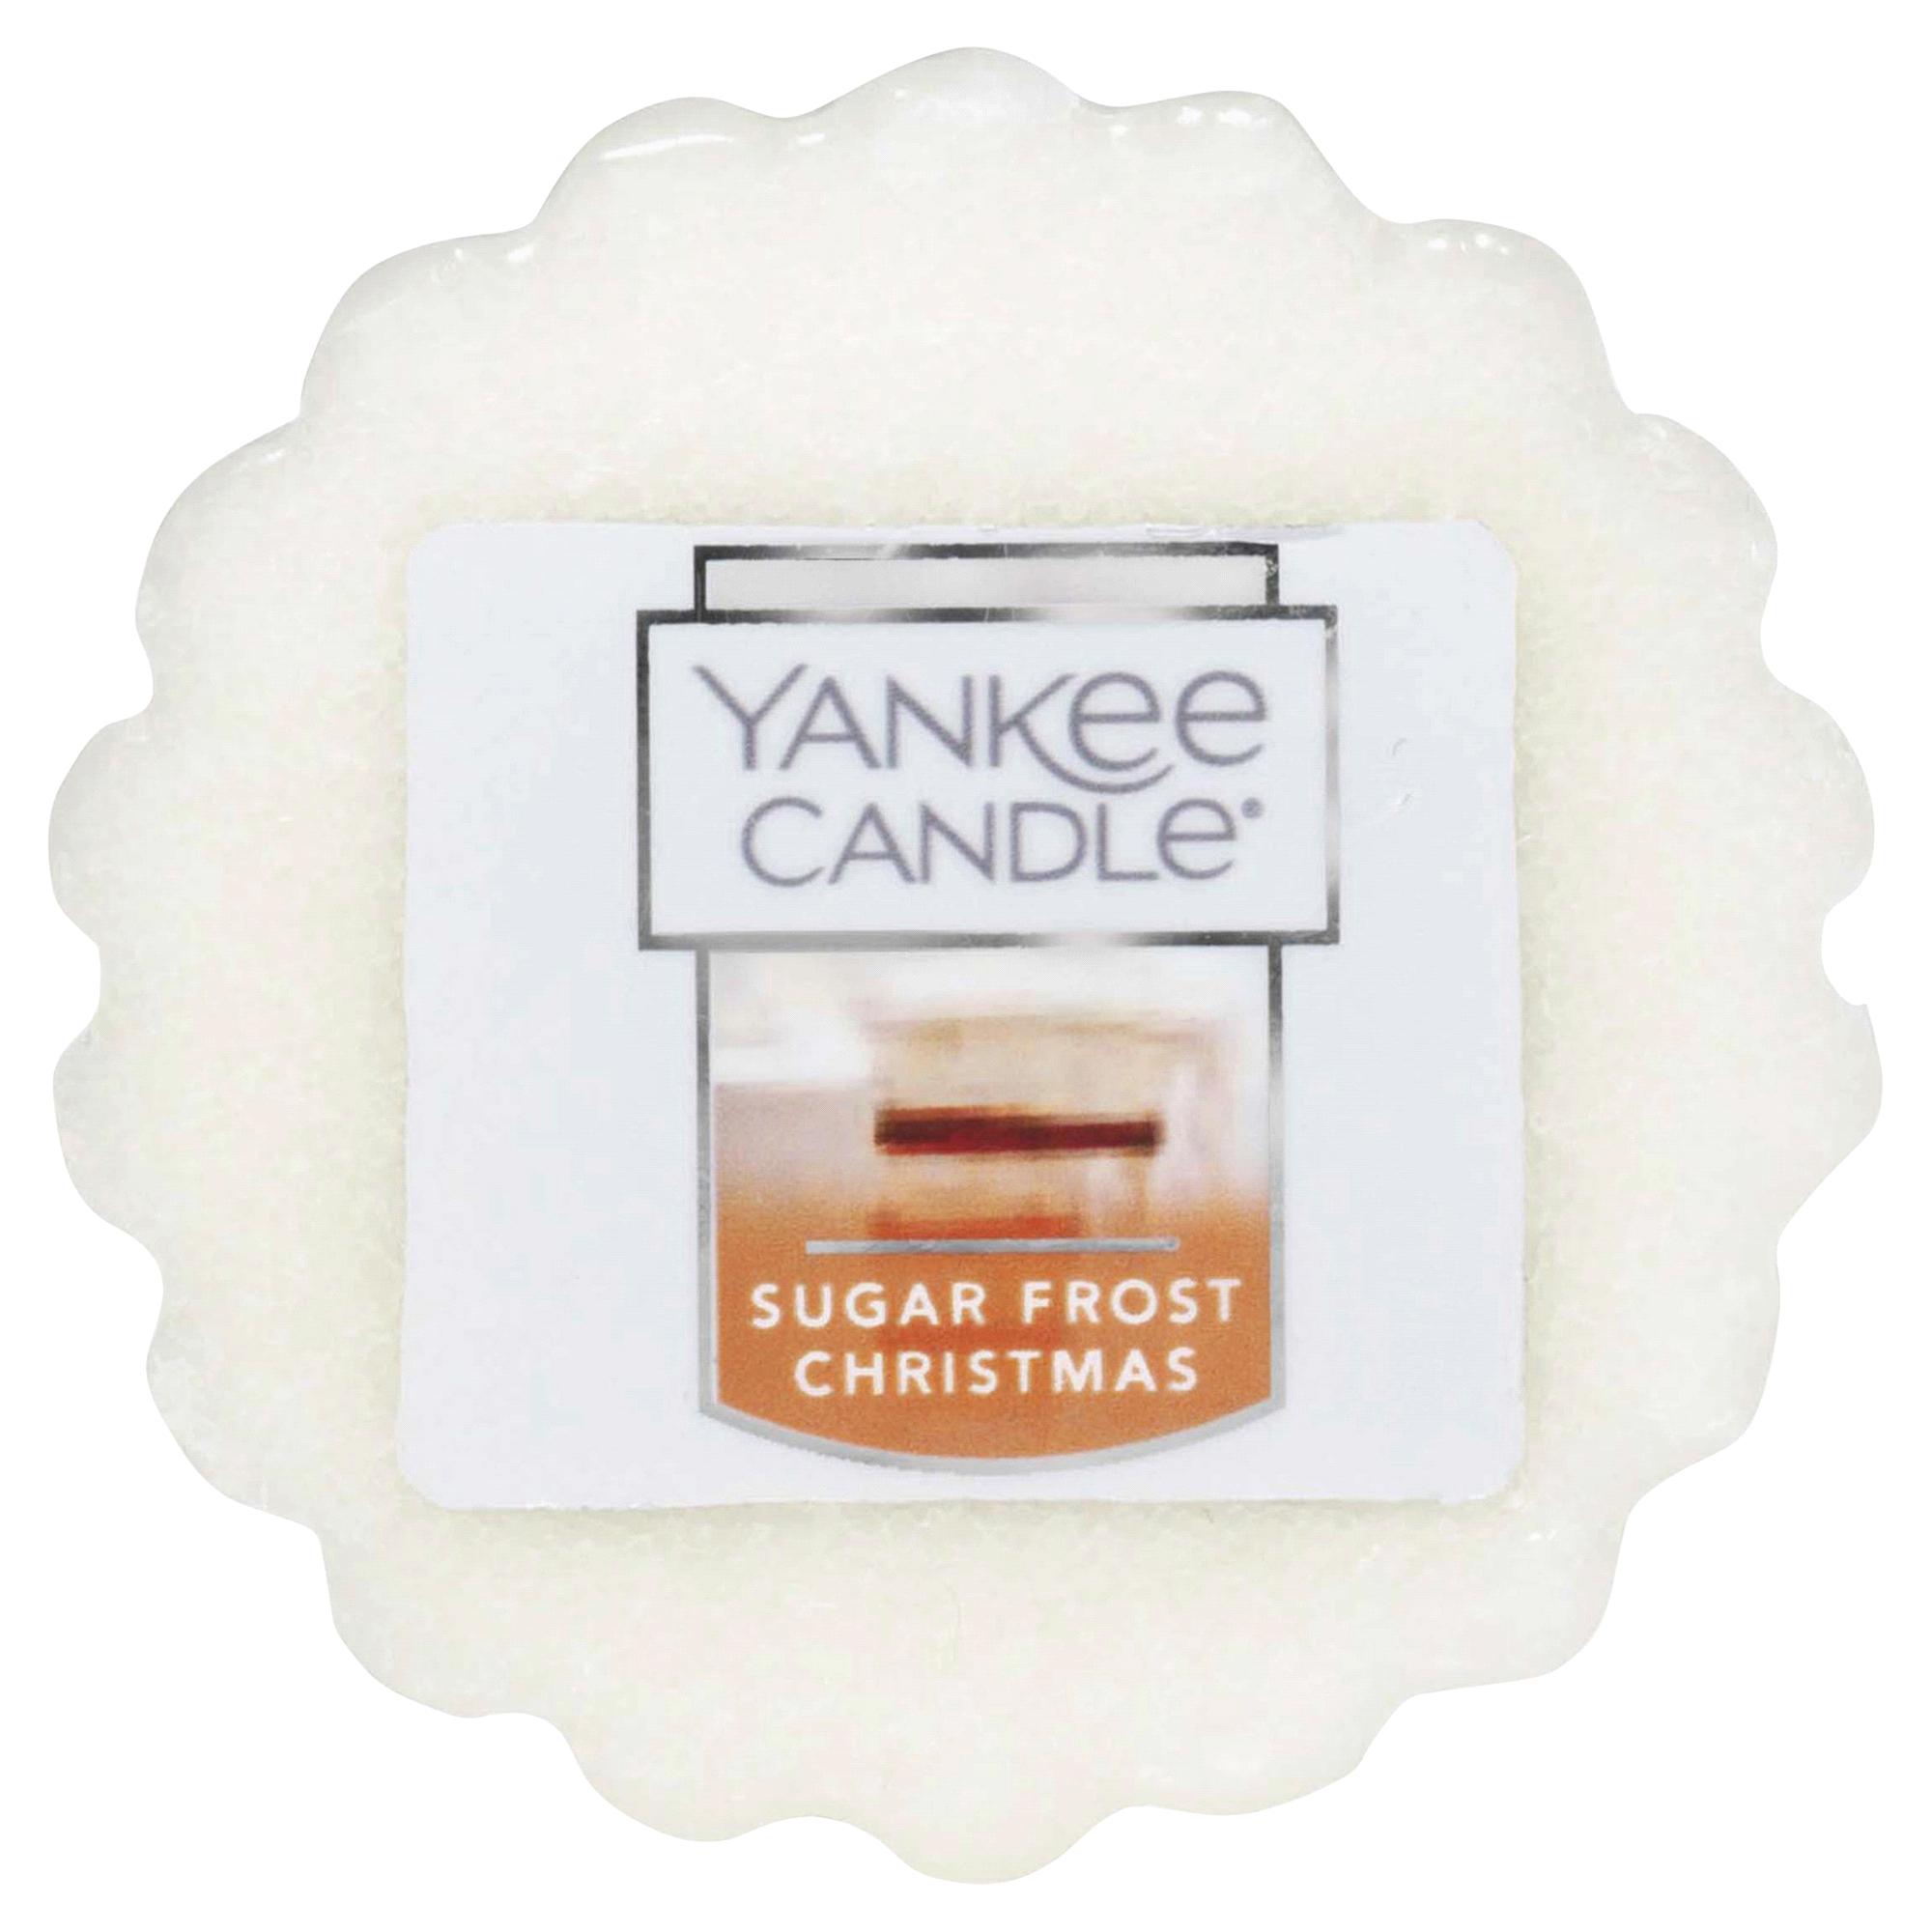 Yankee Candle Tart Sugar Frost Christmas 0.8 Oz. | Meijer.com